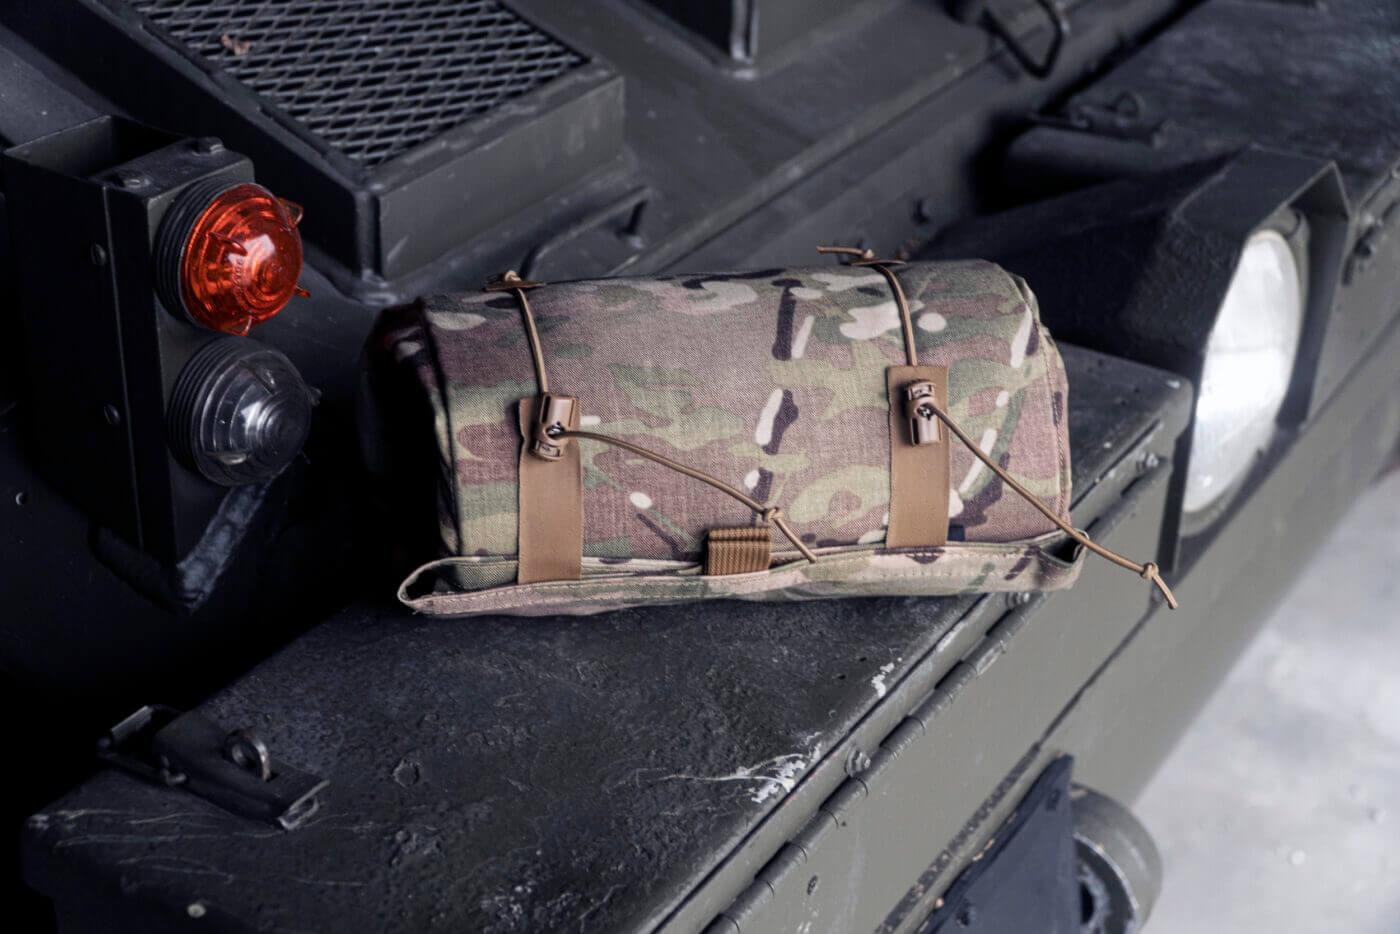 Armageddon Gear Ultralight Shooting Mat